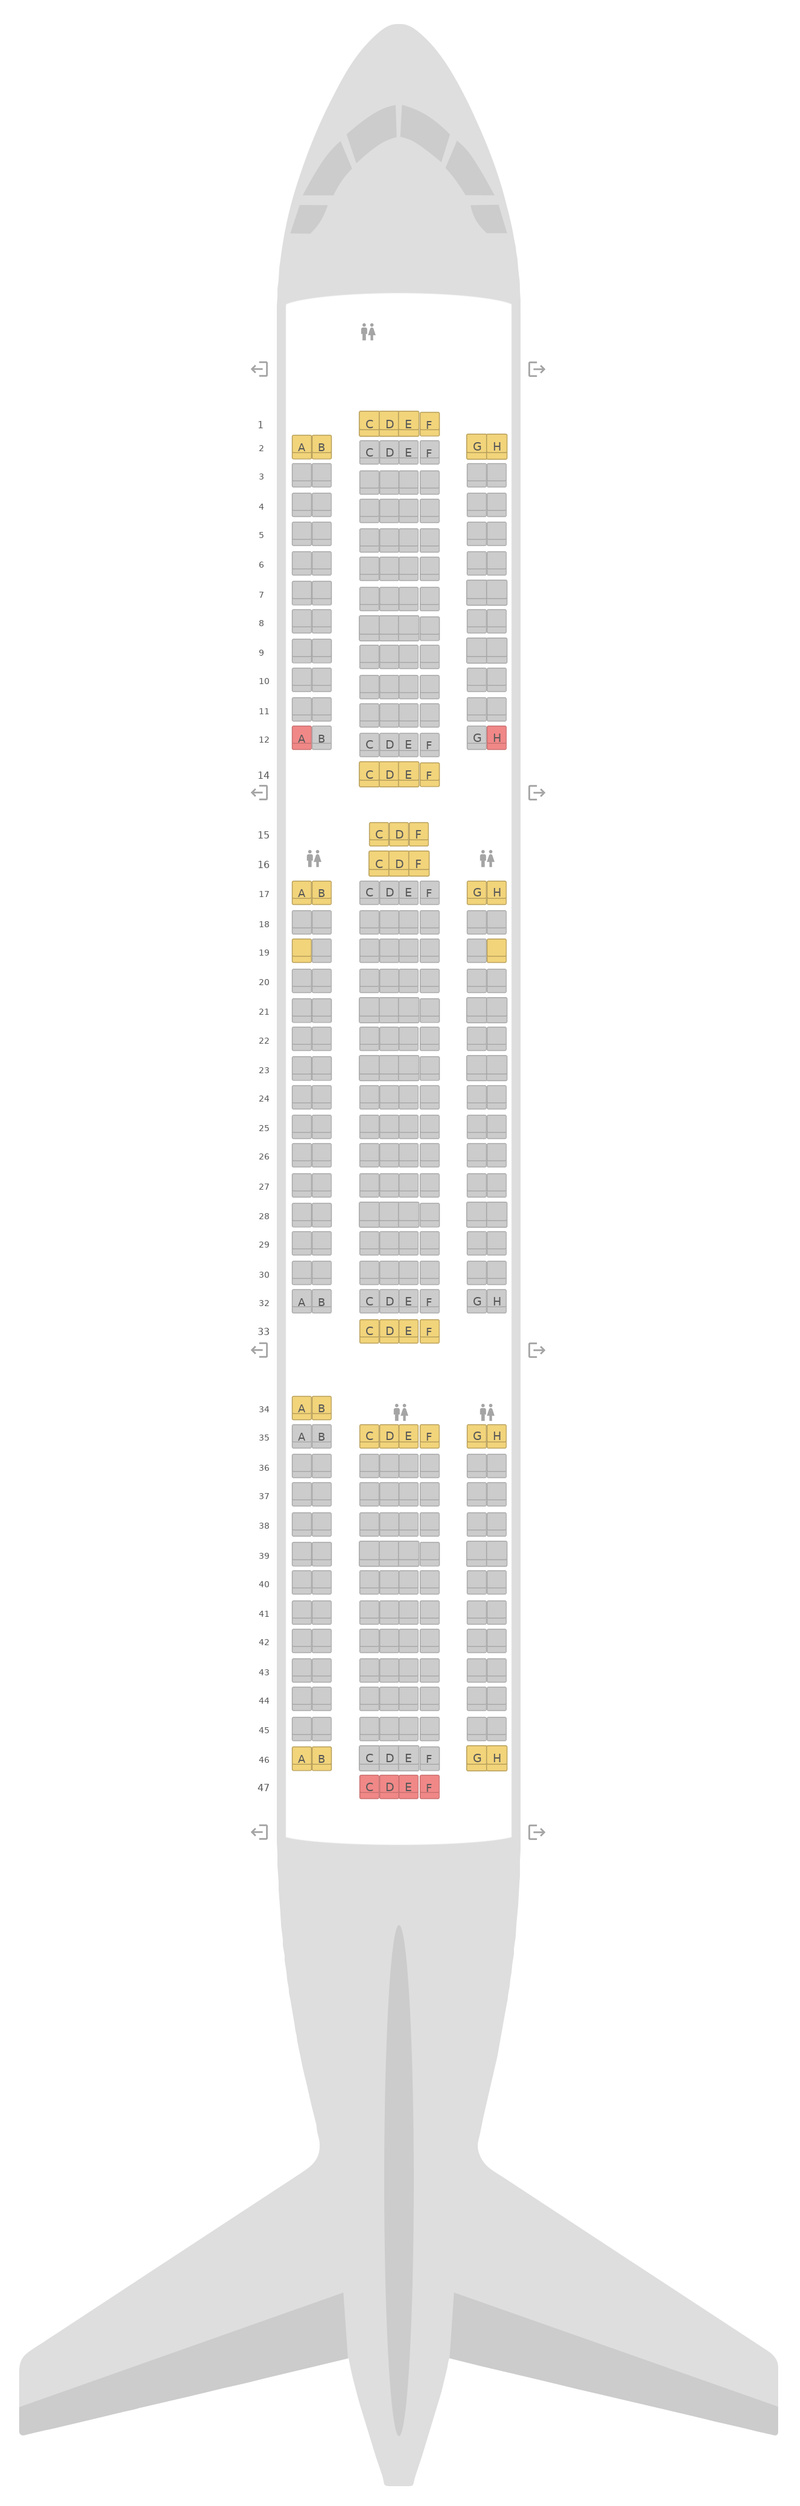 Mapa de asientos Boeing 767-300ER TUI Airways